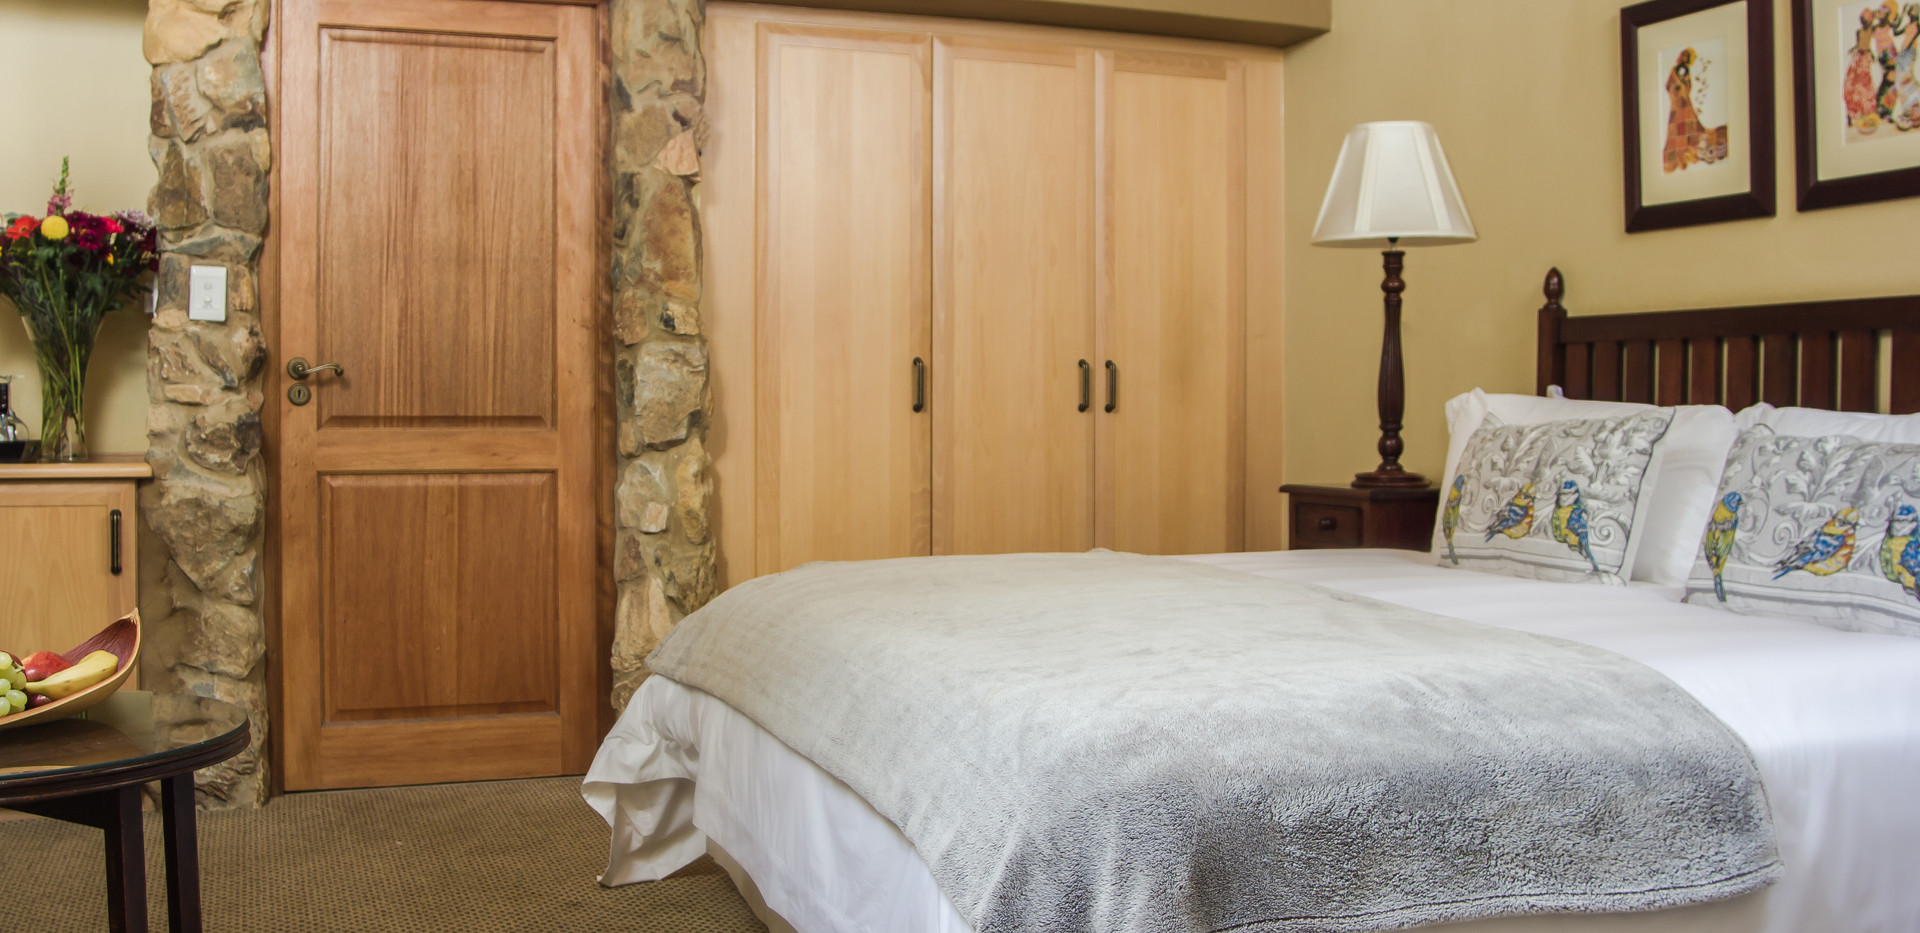 IDWALA HOTEL-072-9 a.jpg